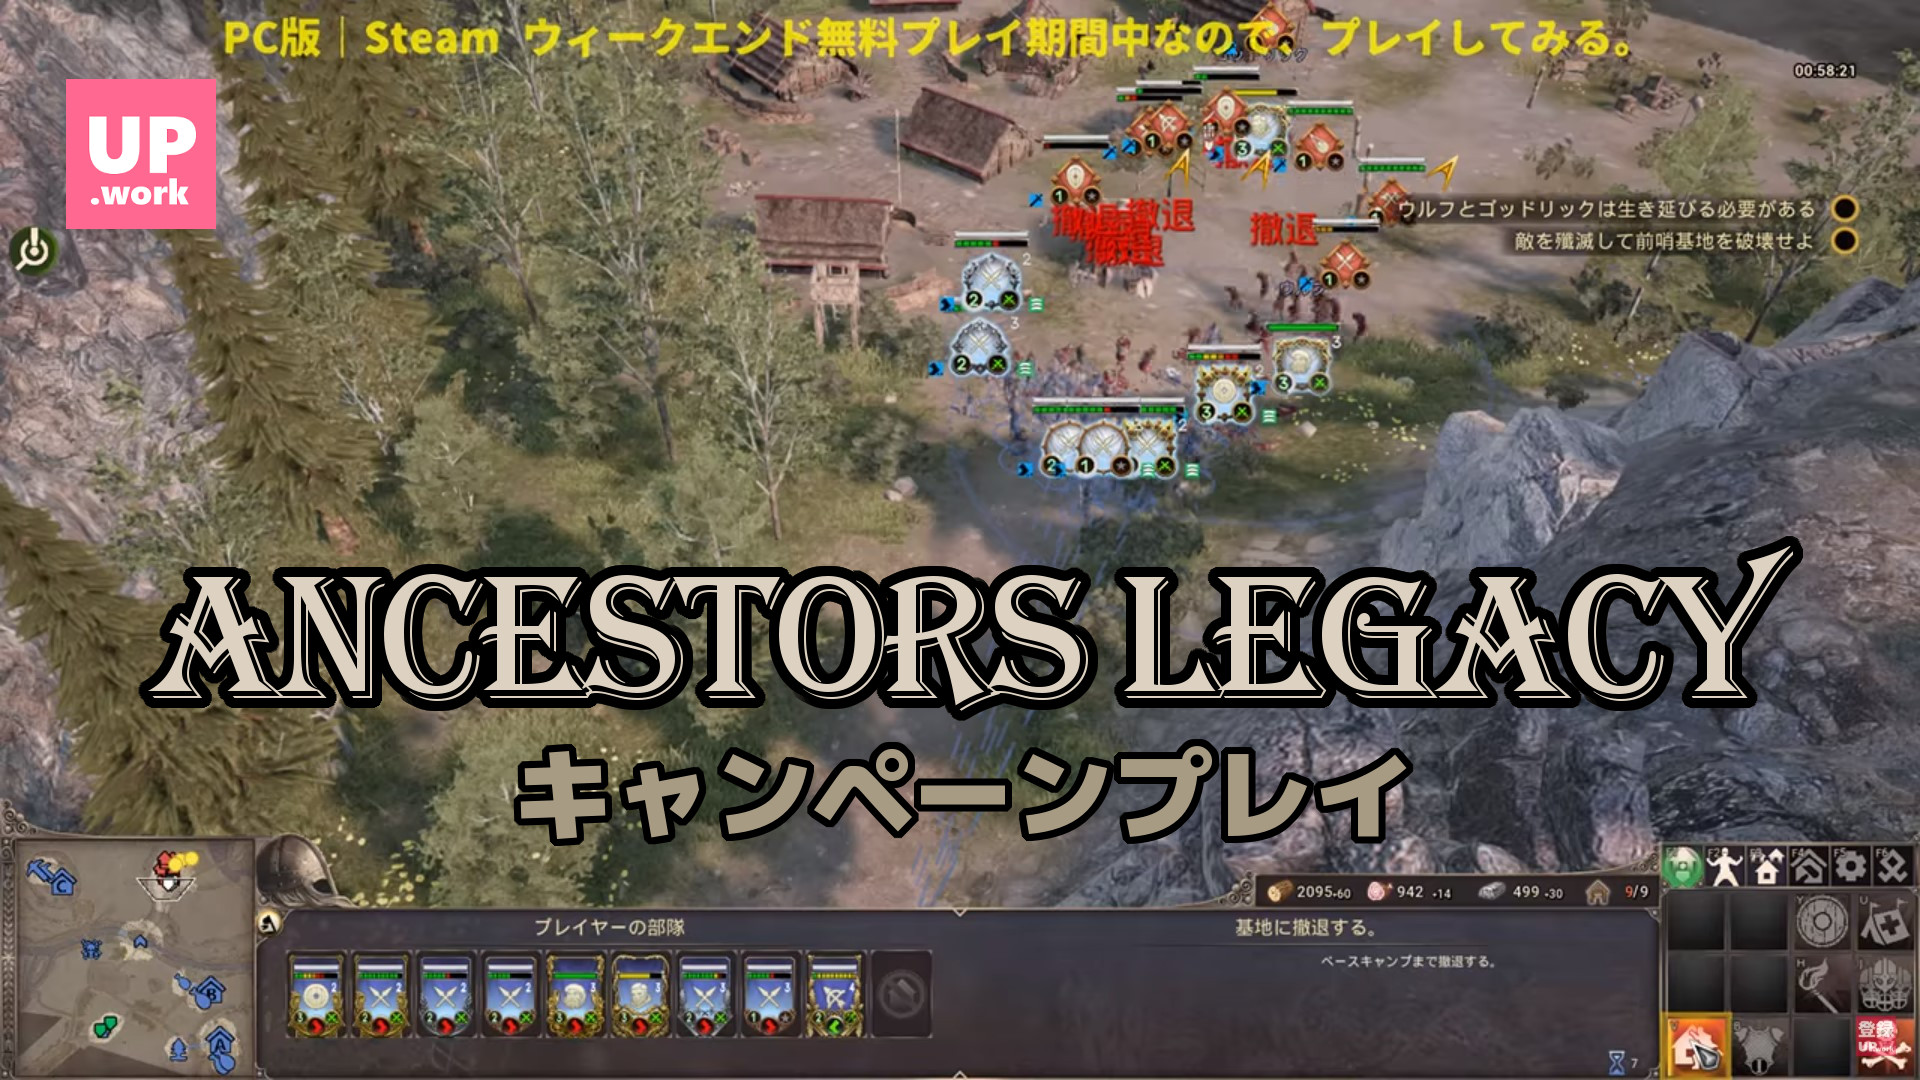 Ancestors Legacy|RTS|ウィークエンド無料プレイ